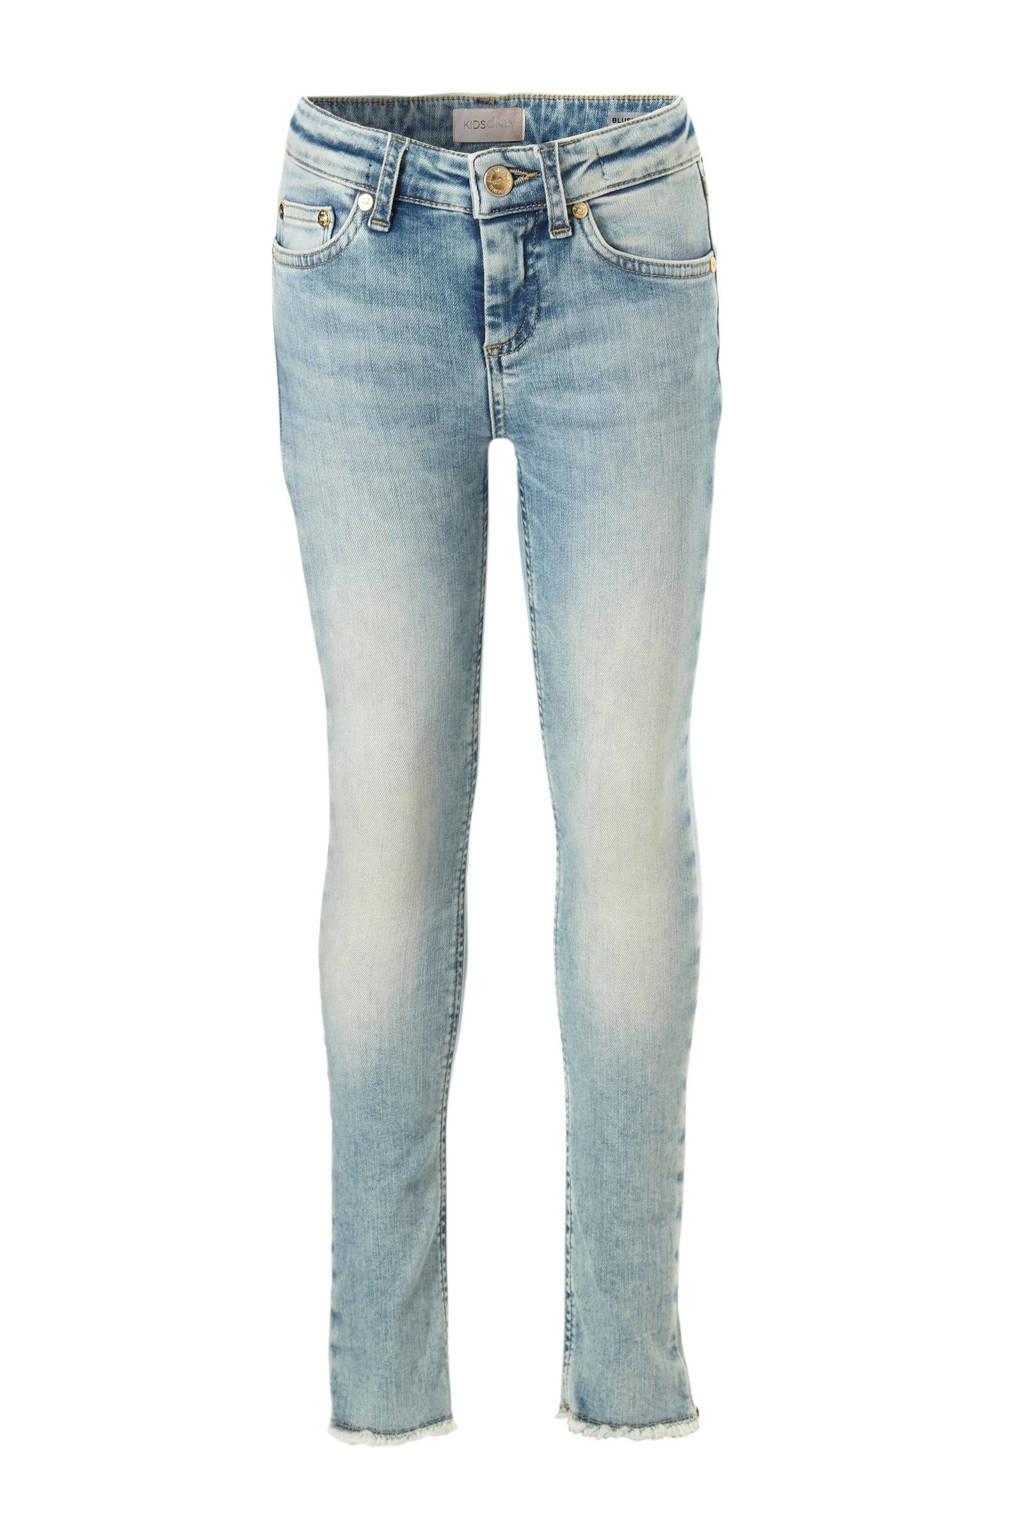 KIDS ONLY skinny fit jeans Blush, Lichtblauw